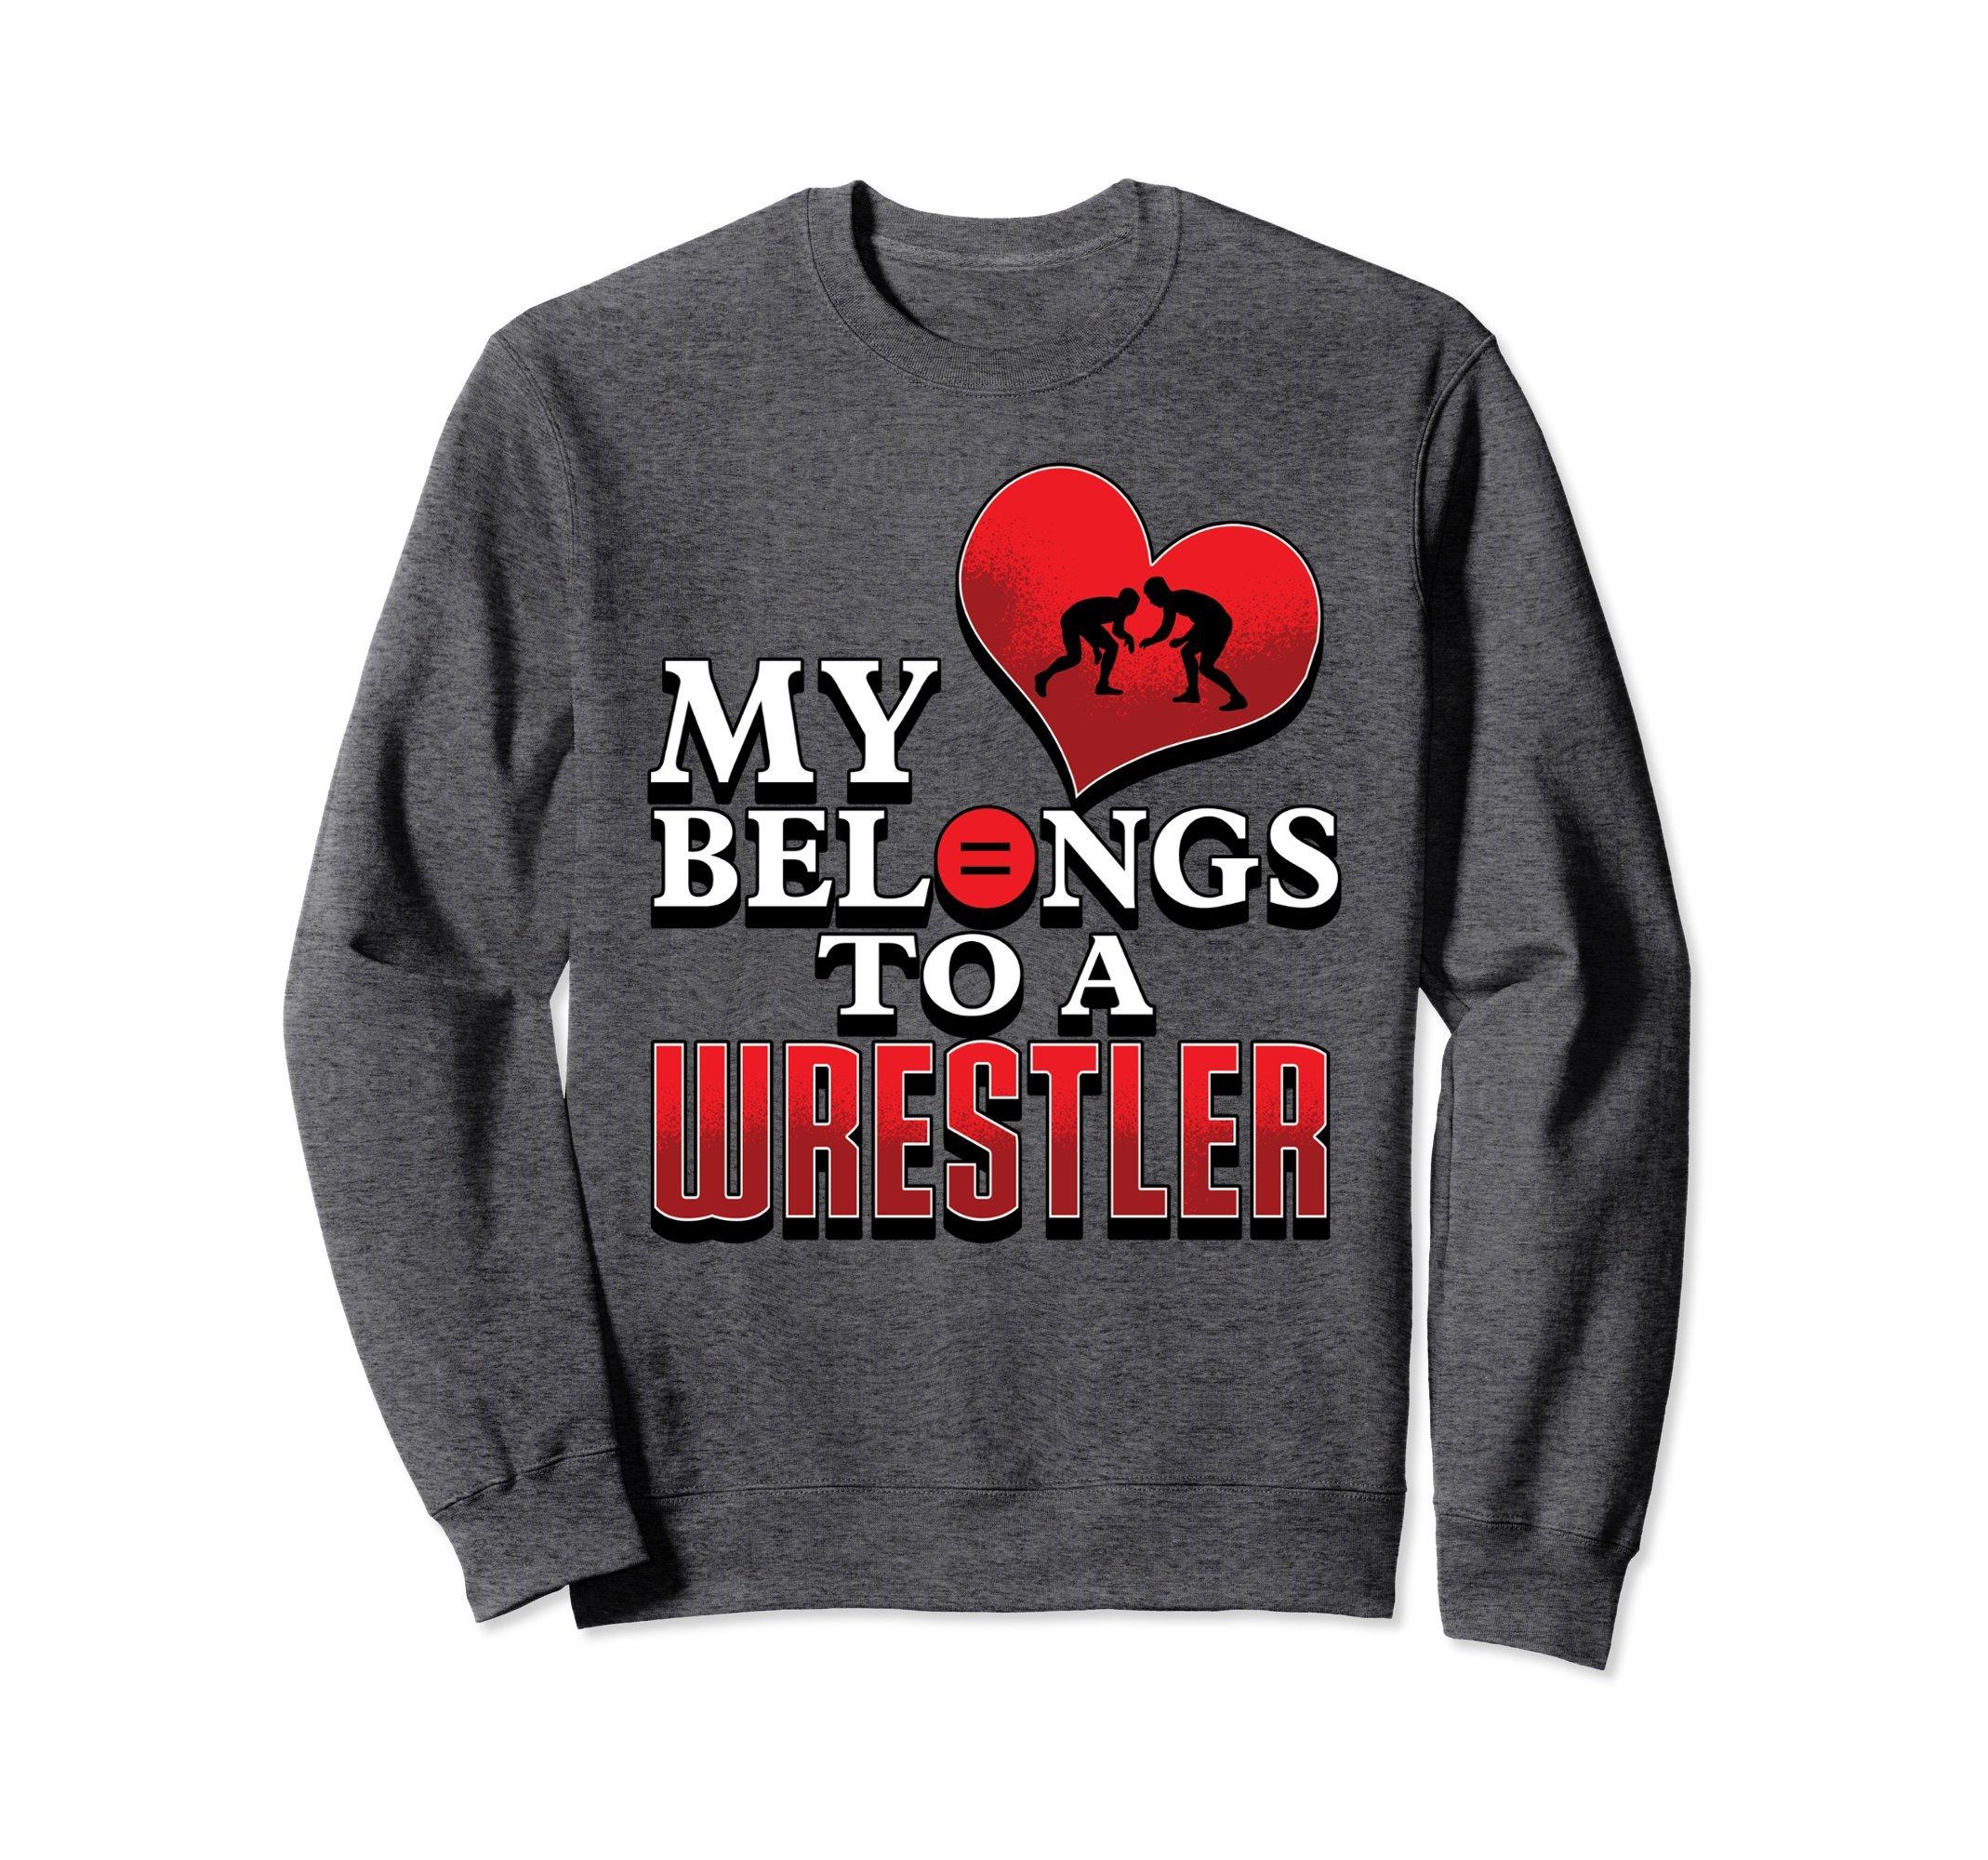 Unisex Wrestling Sweatshirt- My Heart Belongs to a Wrestler Sweater XL: Dark Heather by Wrestling Shirt by Crush Retro